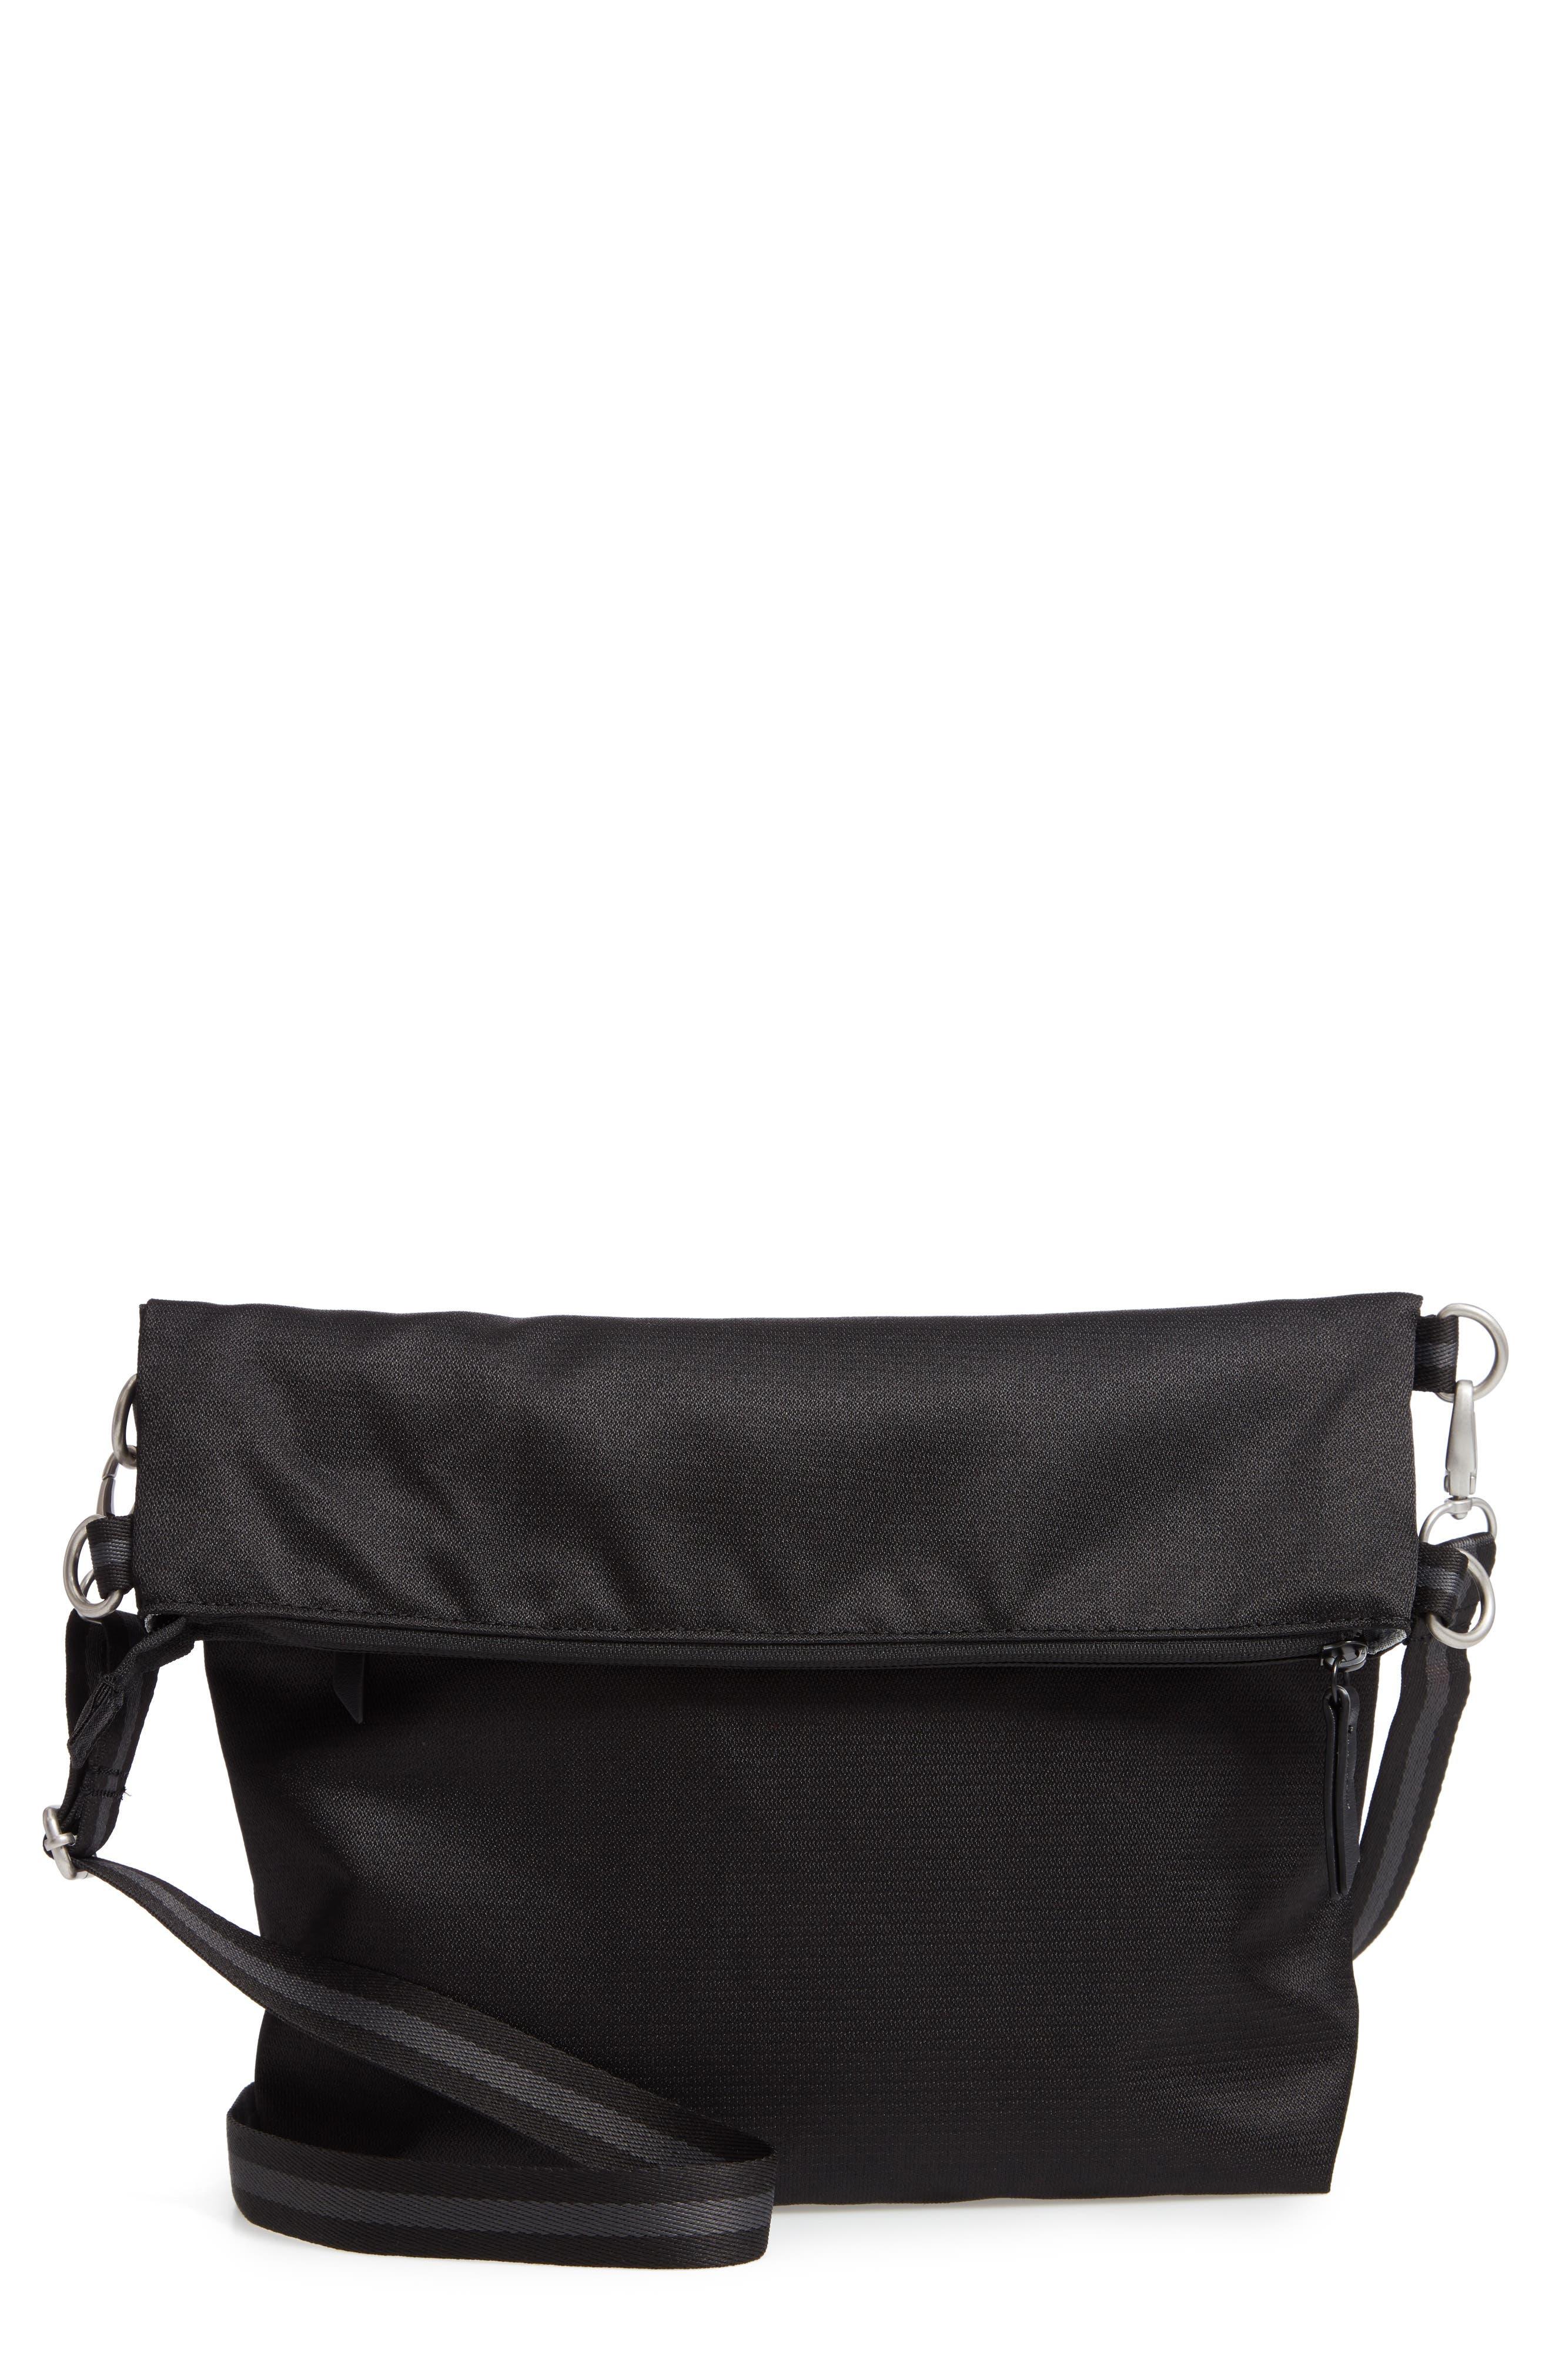 Vale RFID Crossbody Bag,                         Main,                         color, BLACK/ BLACK